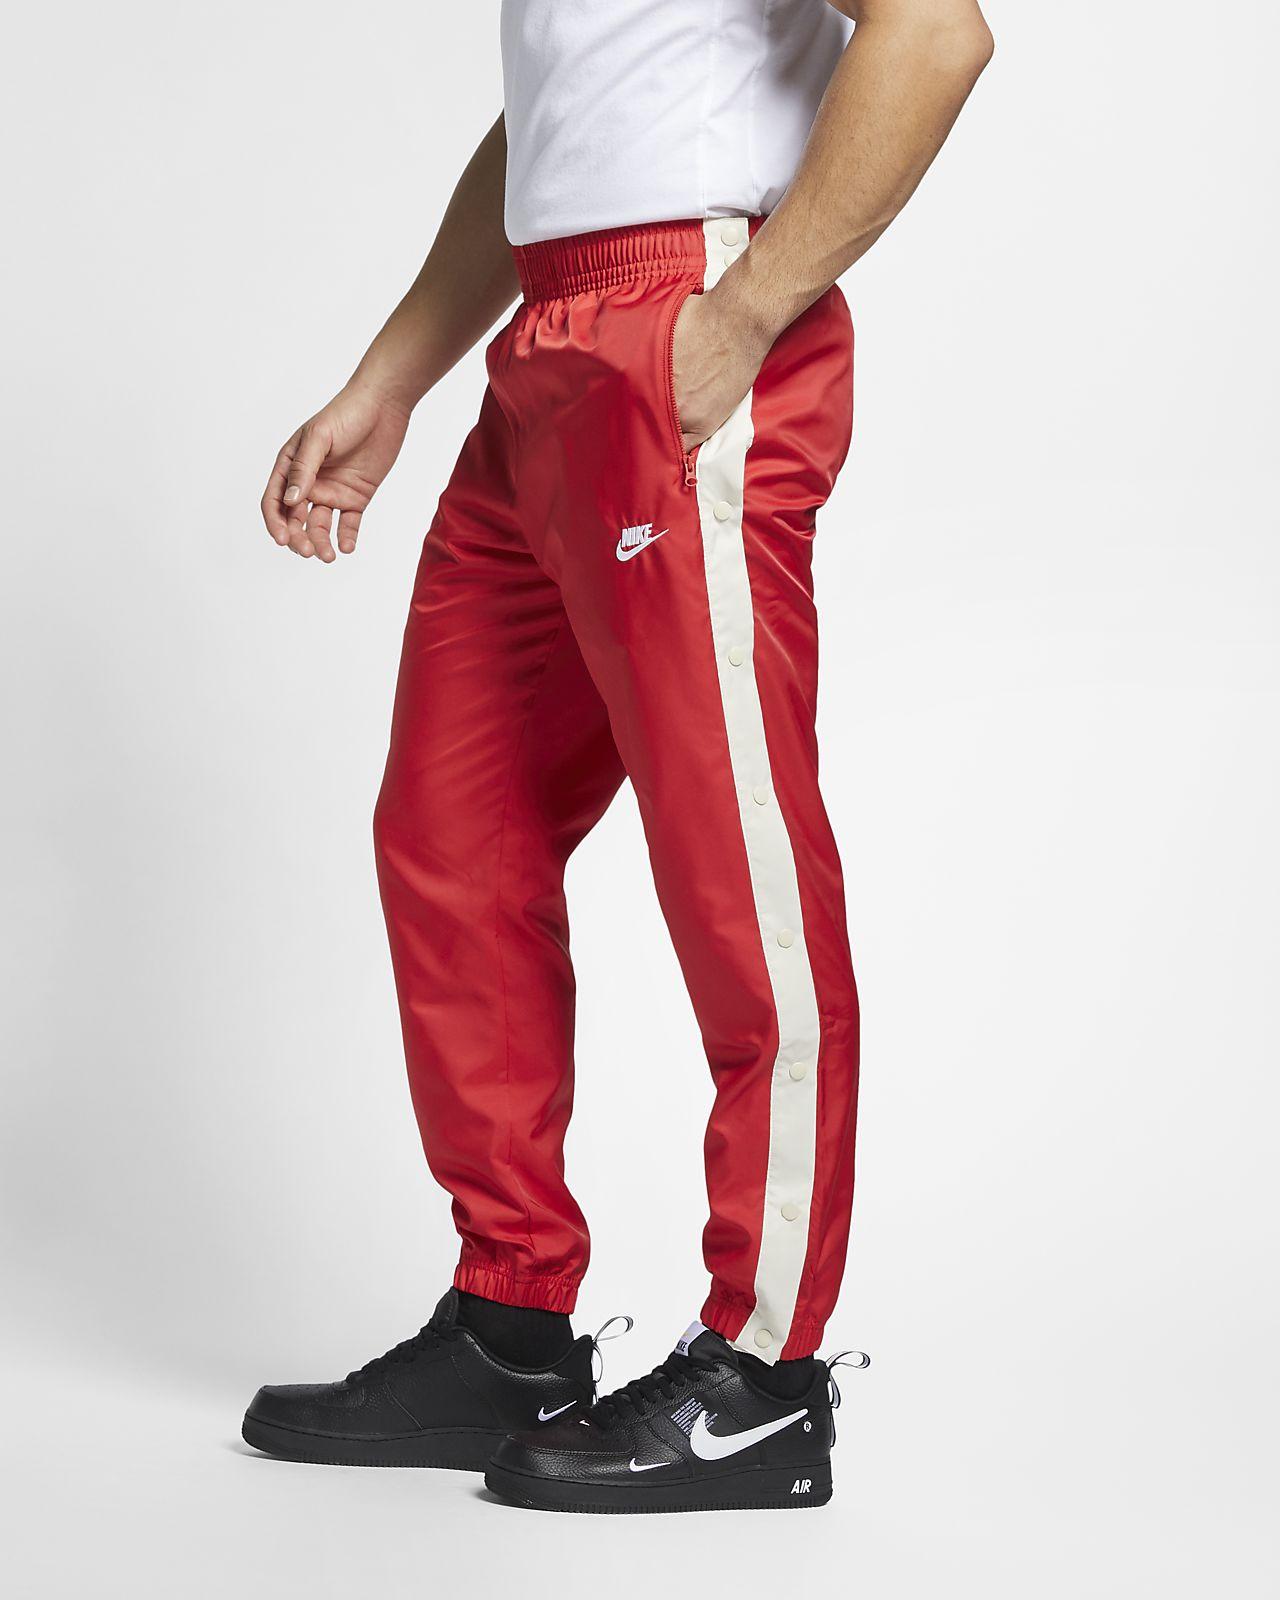 9cbf75a85cba Nike Sportswear Men s Woven Track Pants. Nike.com